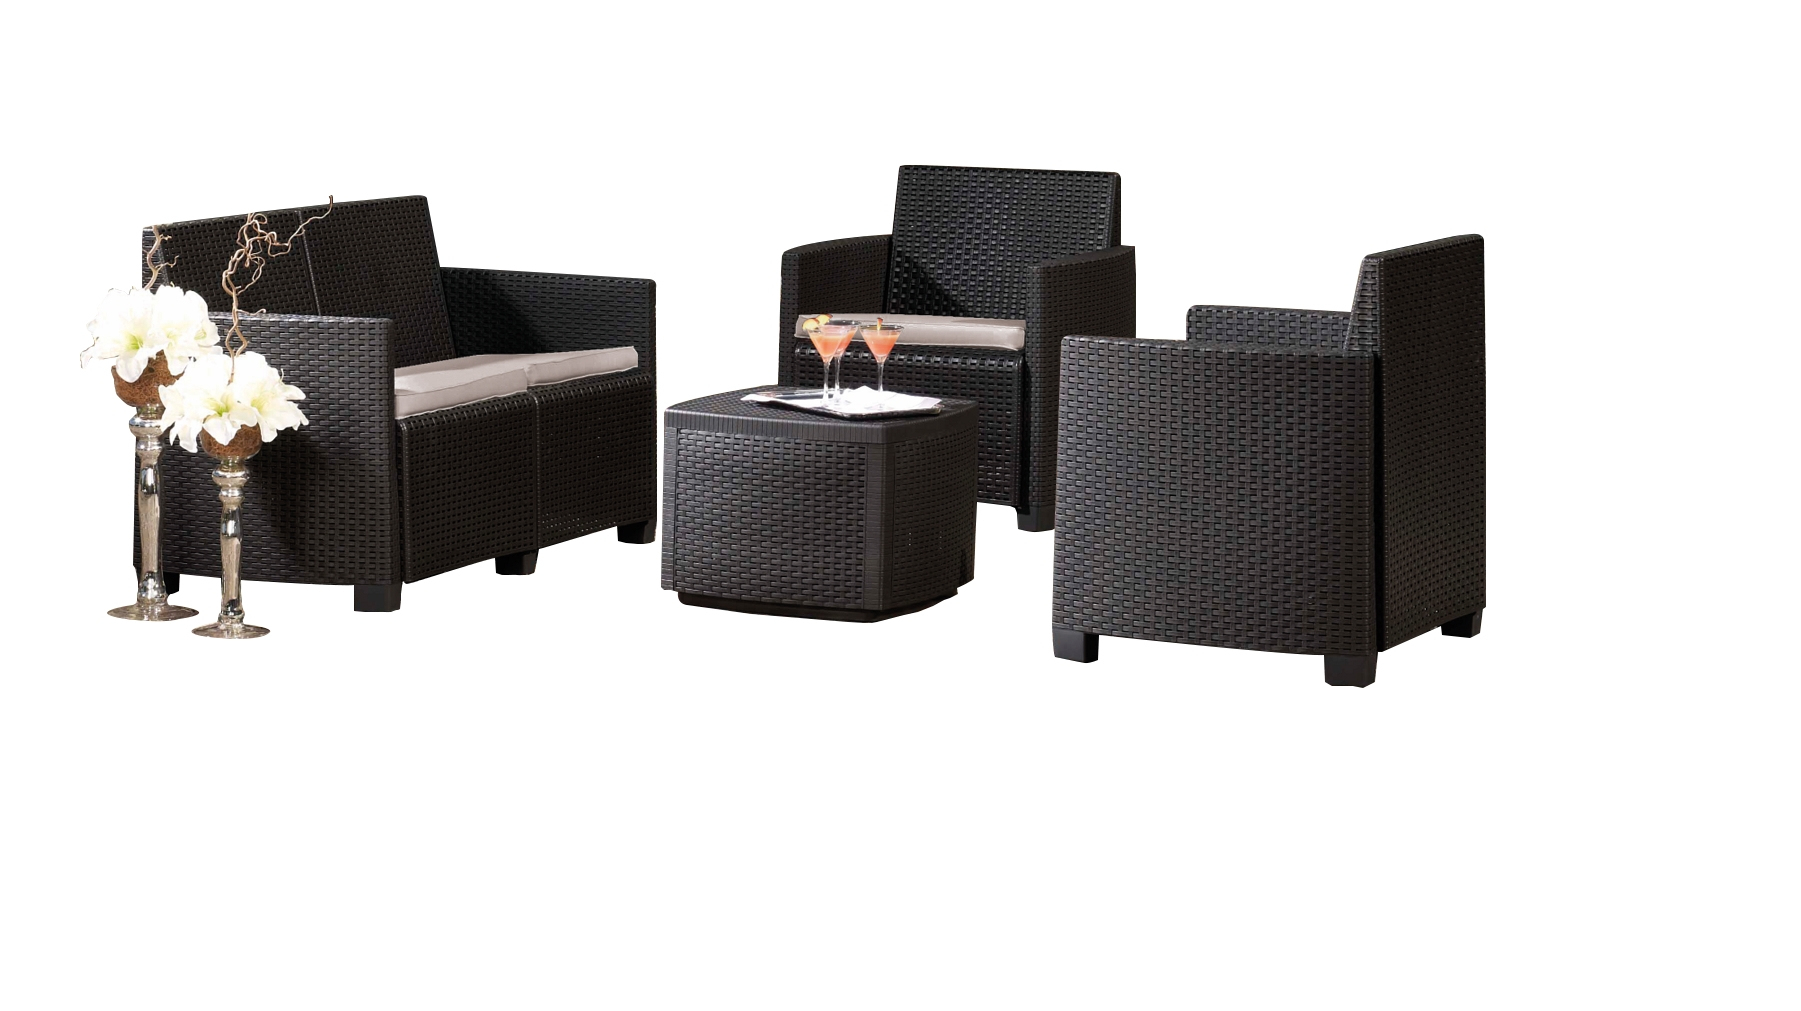 Salon De Jardin Etna Lounge - Mr.bricolage tout Salon De Jardin Monsieur Bricolage